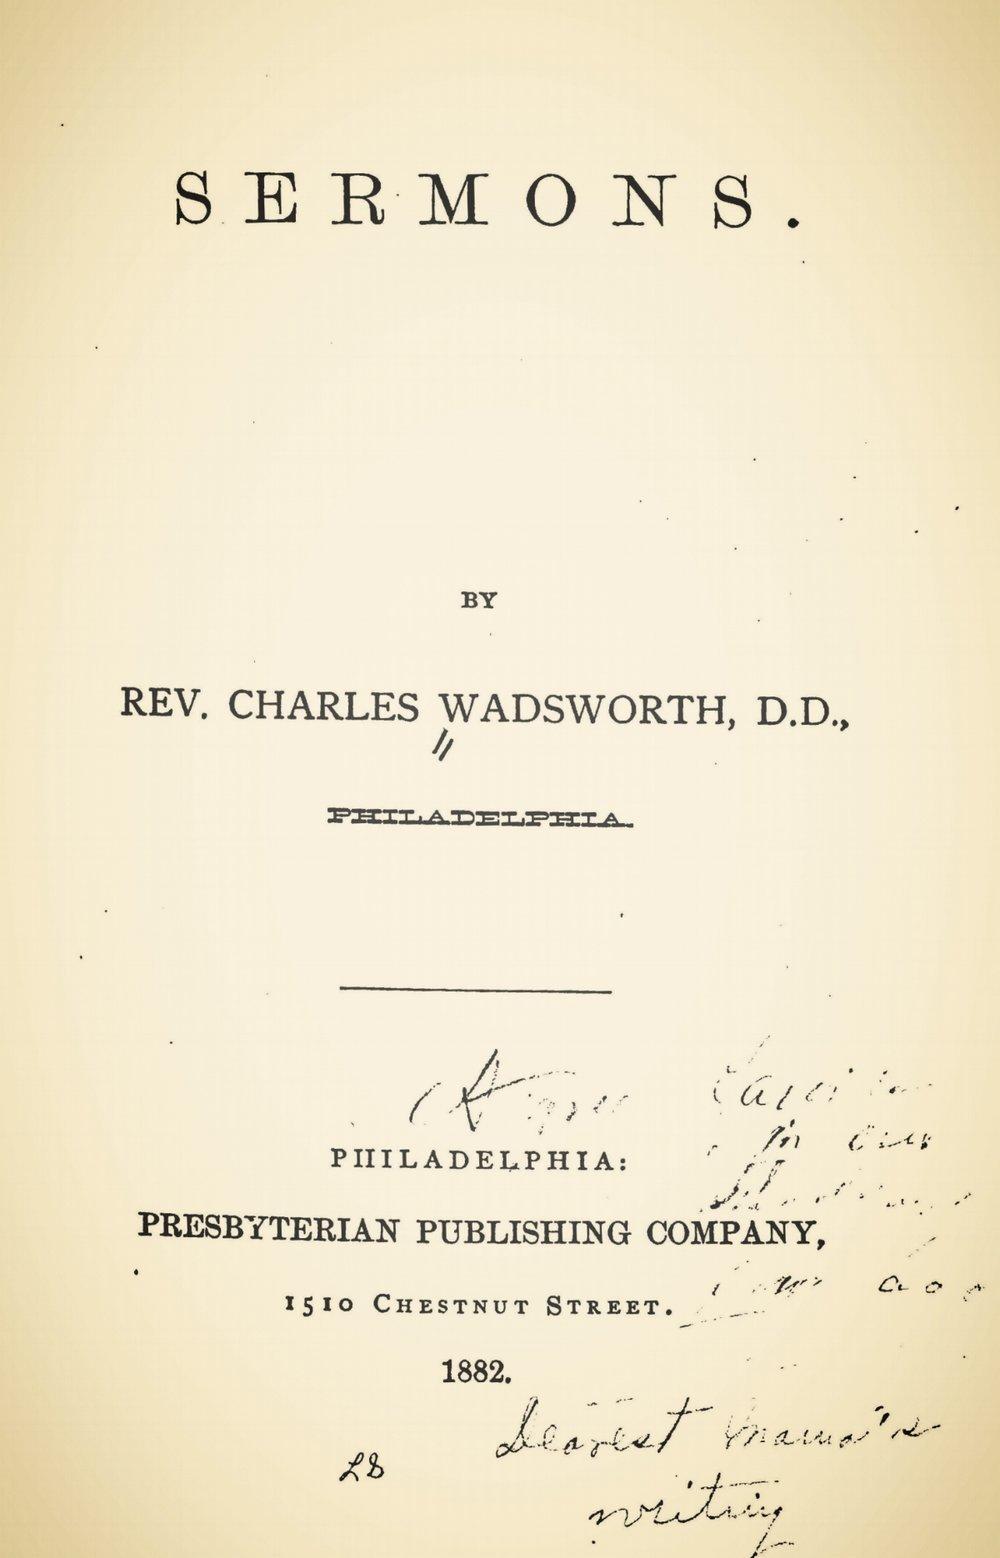 Wadsworth, Charles, Sermons 1882 Title Page.jpg